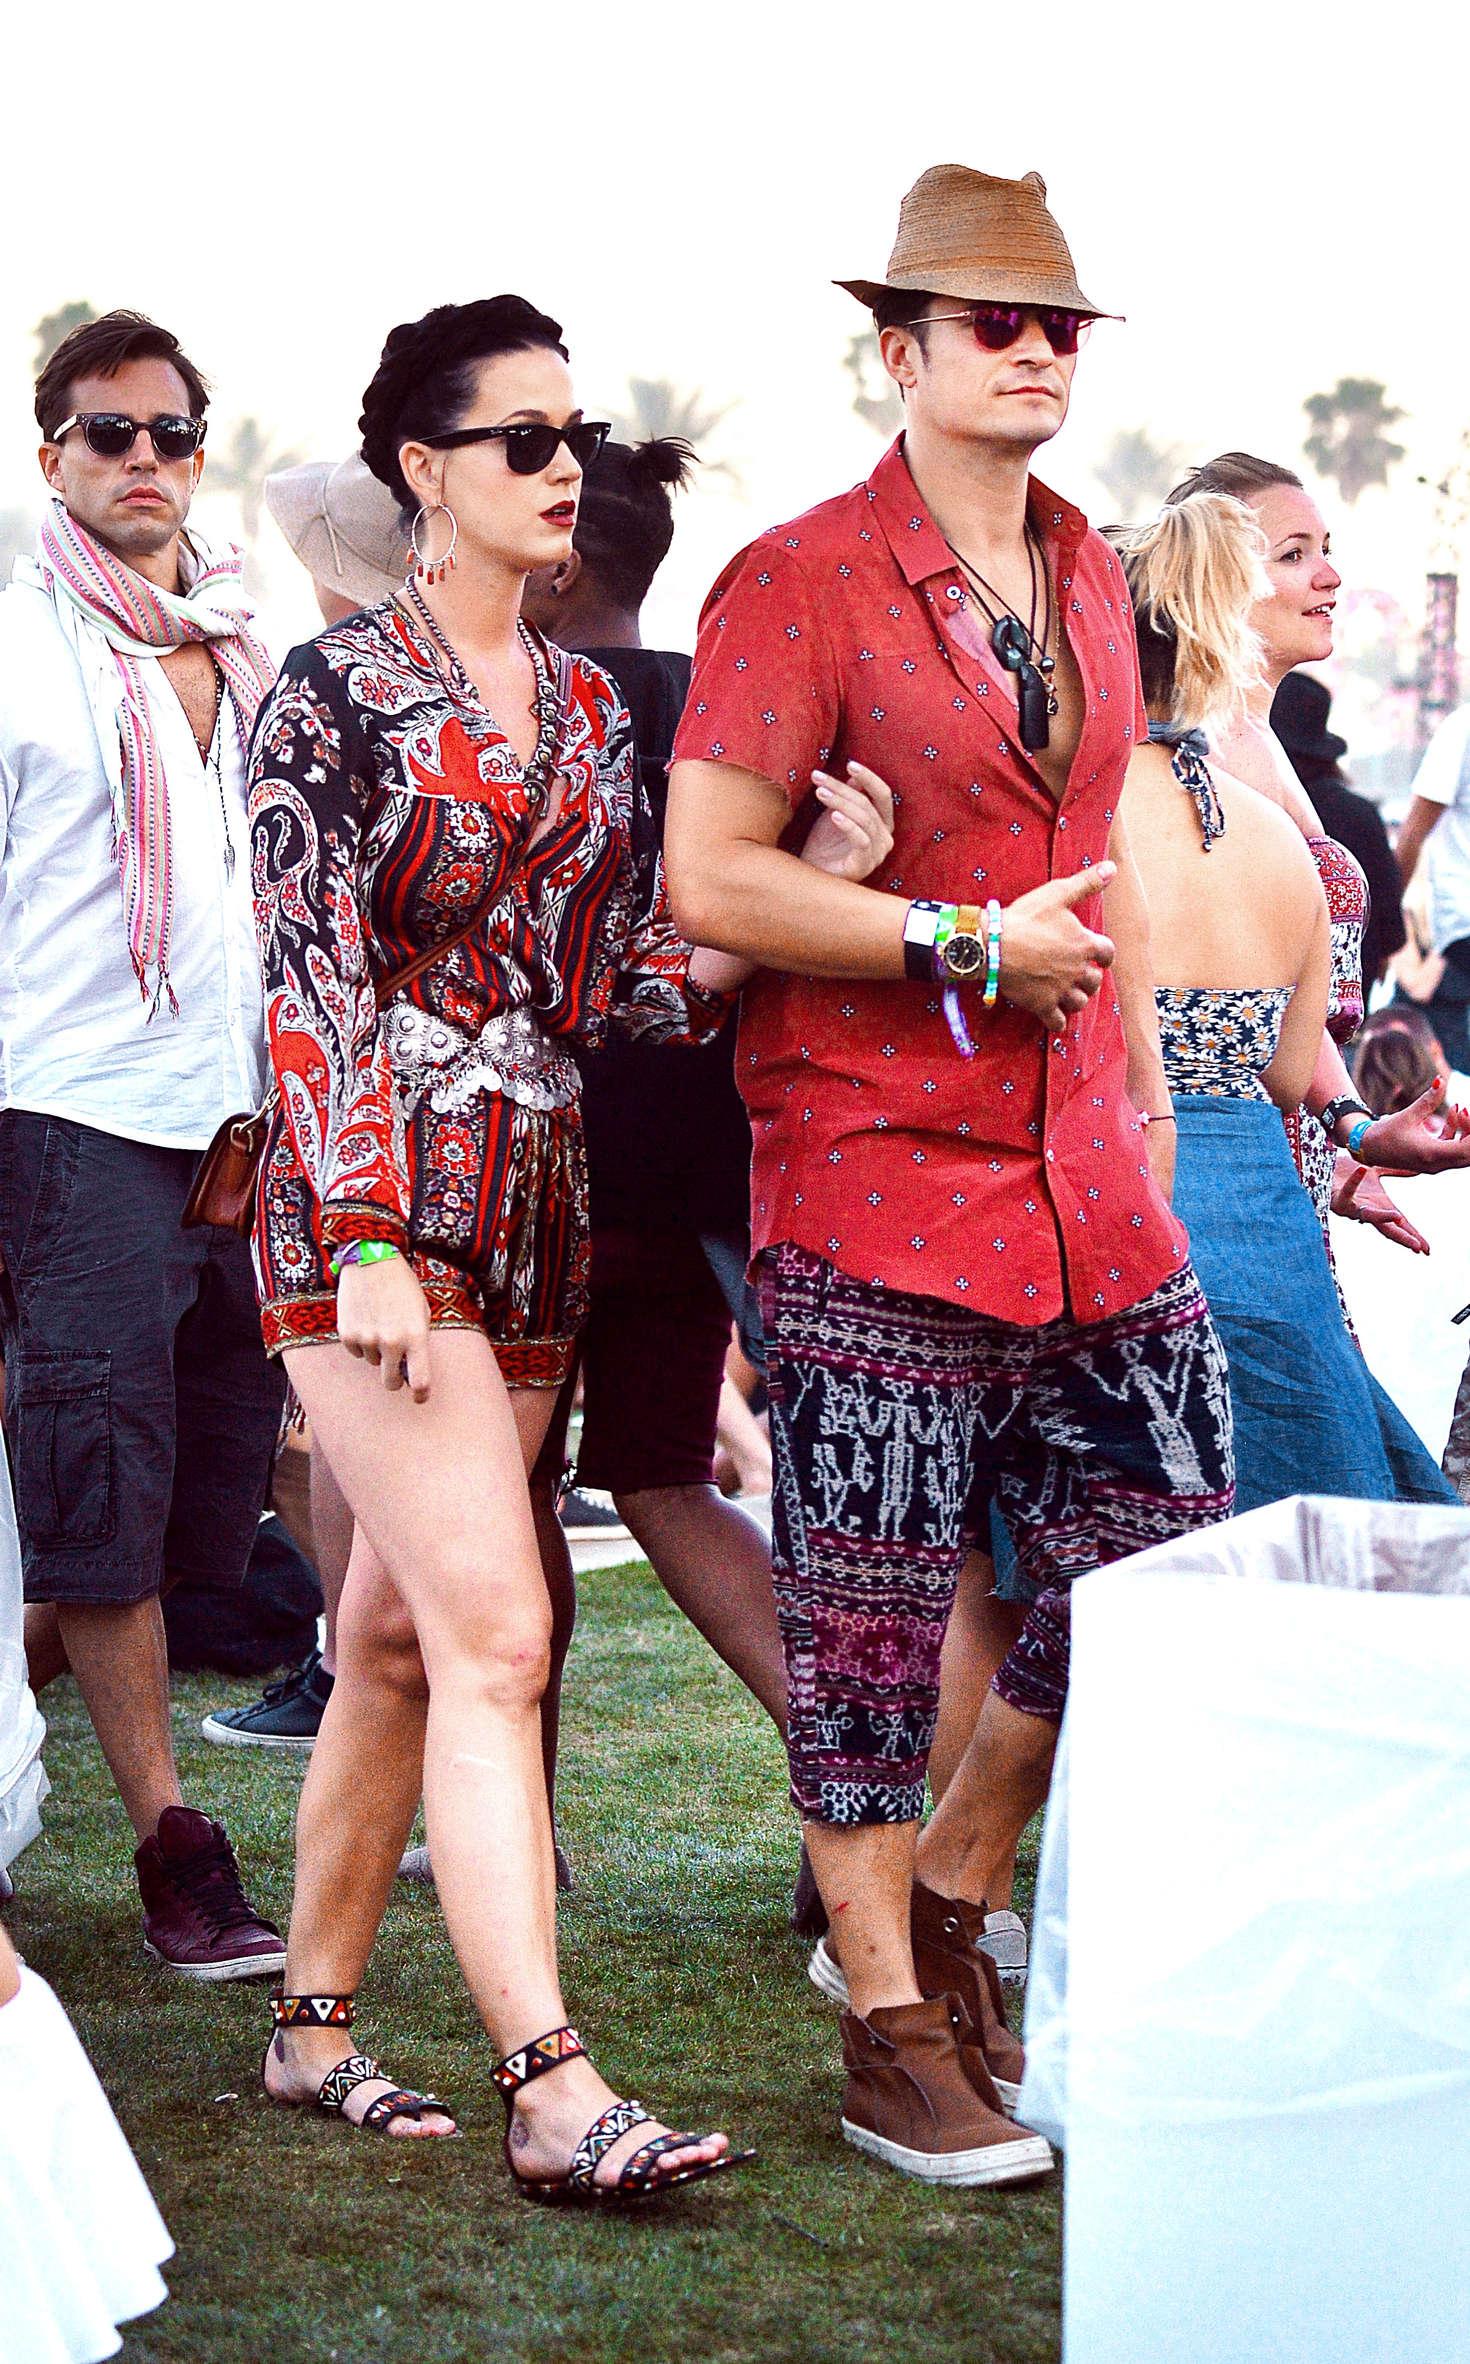 Katy Perry and Orlando Bloom Coachella 2016 day 3  01 1470x2364